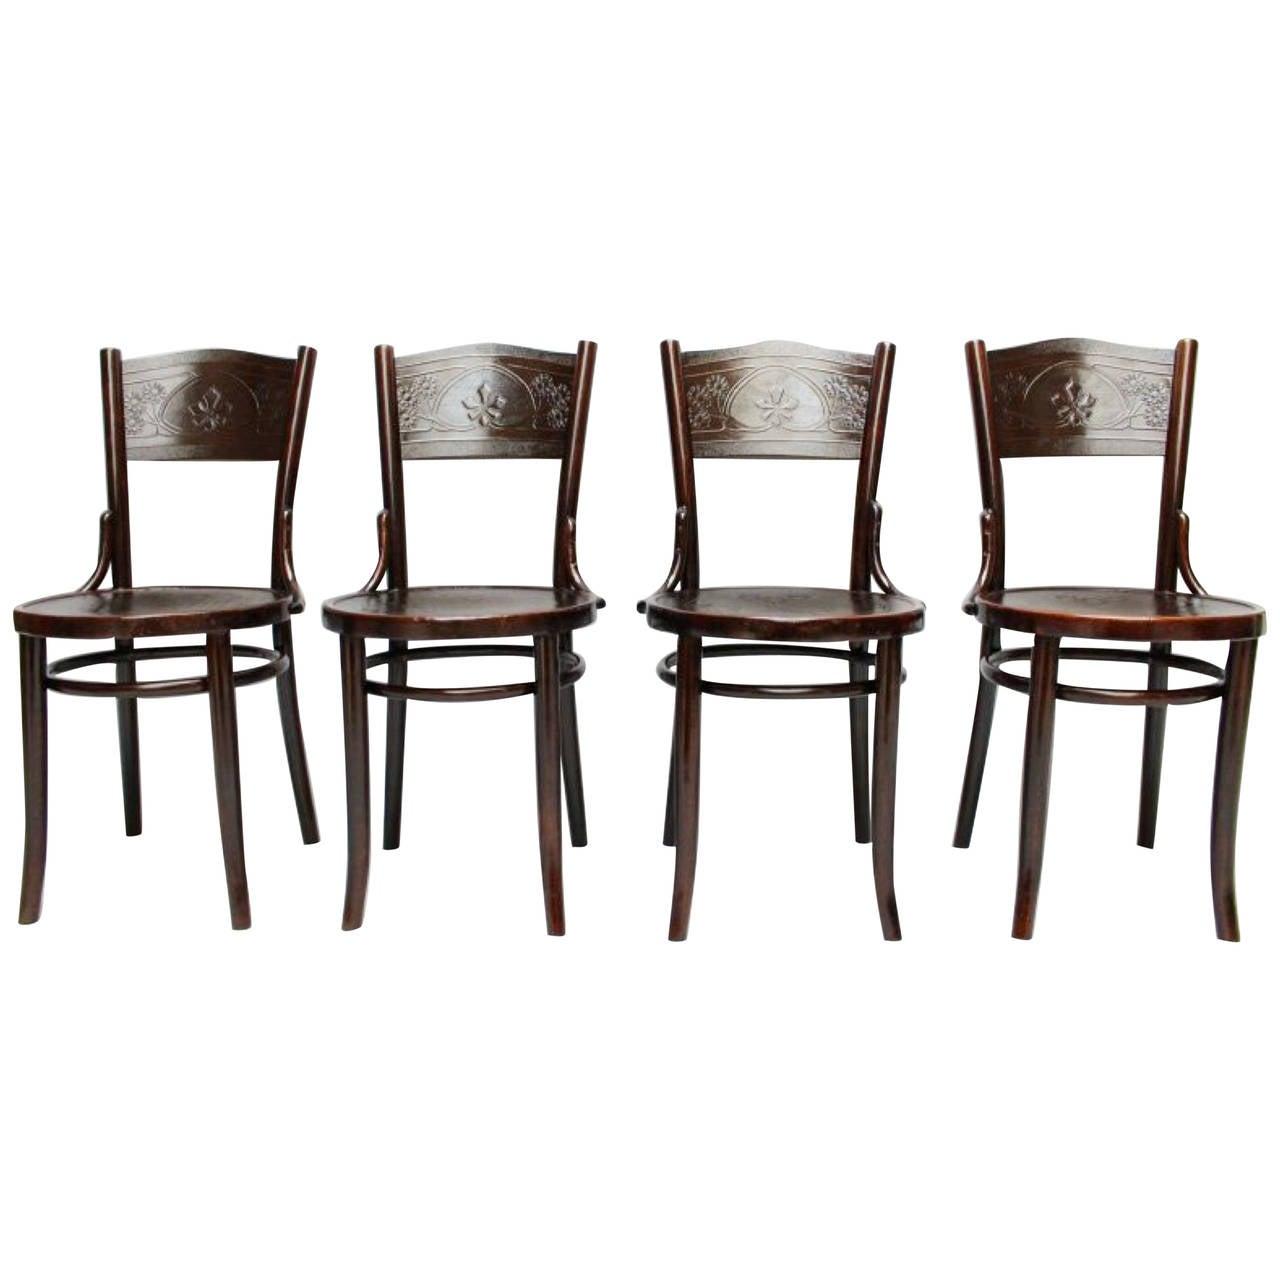 Thonet-Mundus Side Chairs